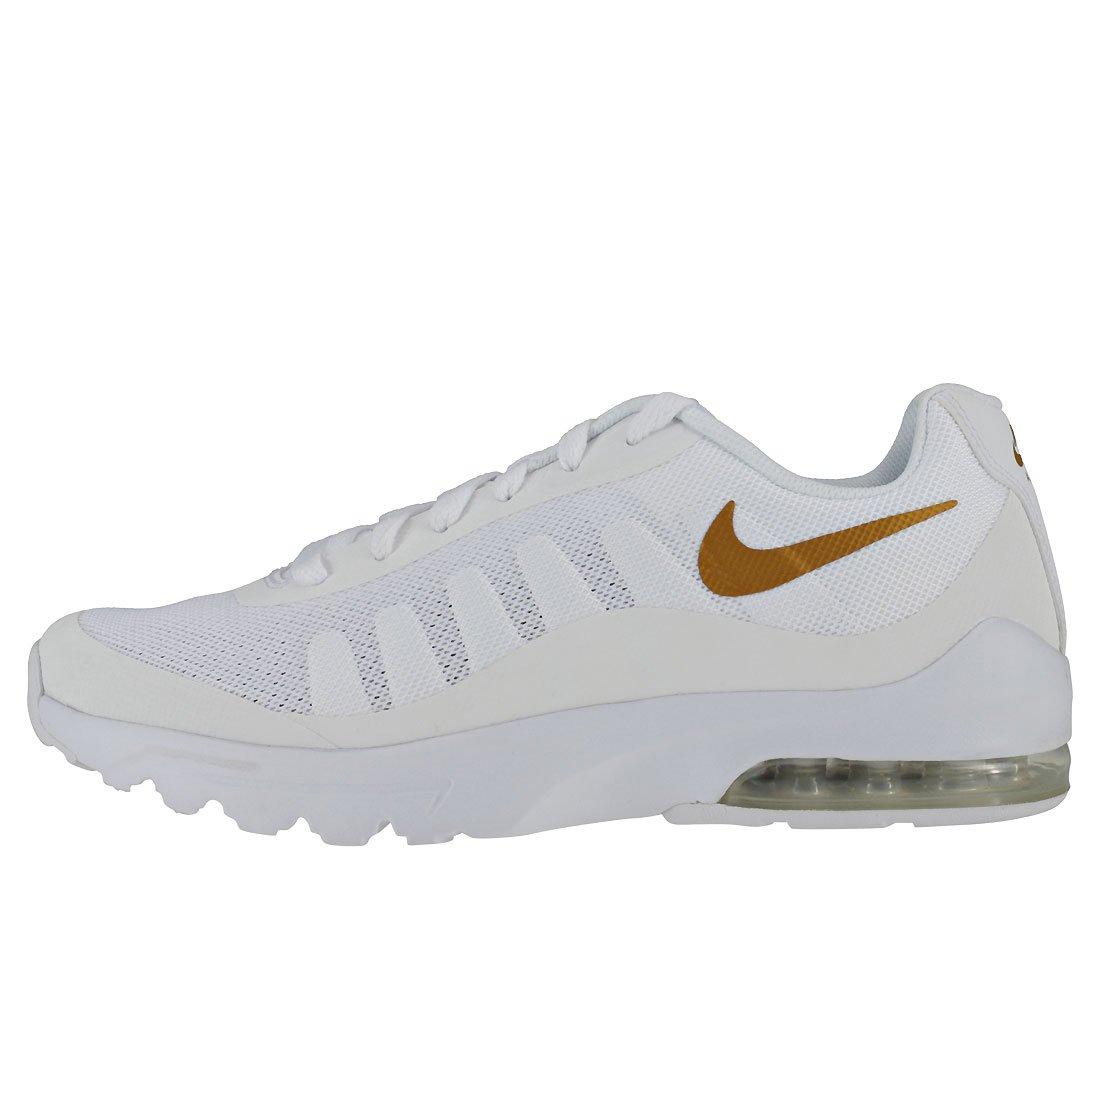 a83293d6ac Nike Boys Air Max Invigor (Gs) Training Shoes: Amazon.co.uk: Shoes & Bags